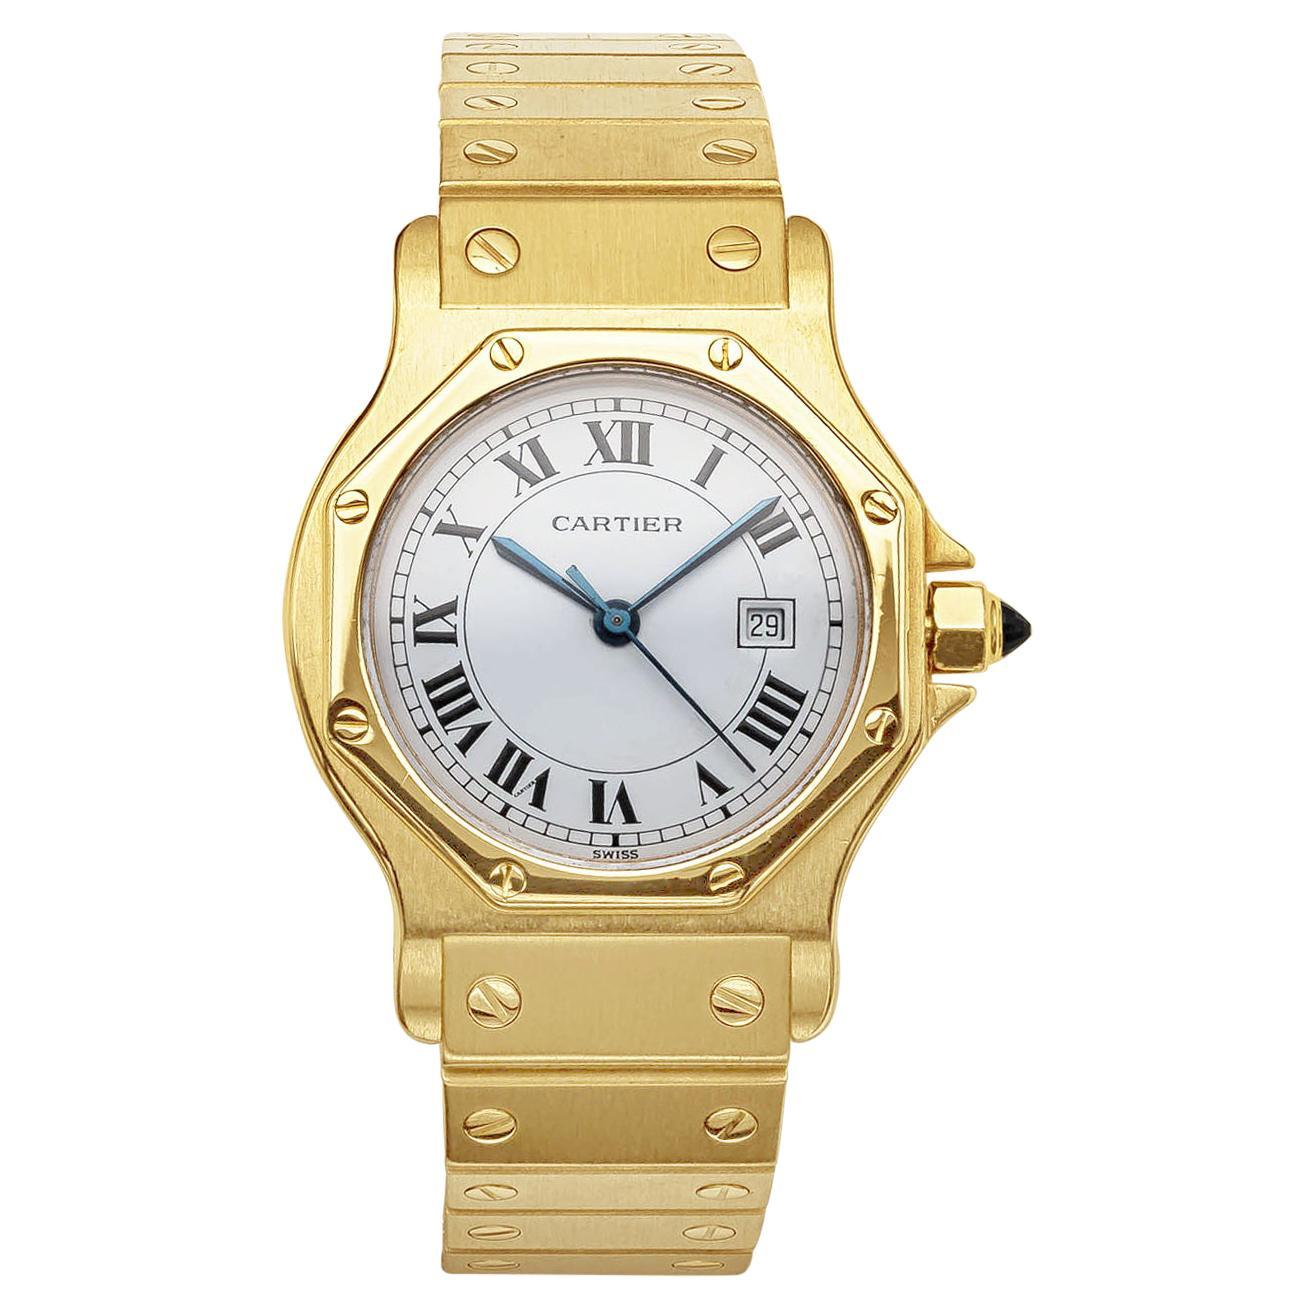 Cartier Santos Automatique 18k Yellow Gold Wristwatch